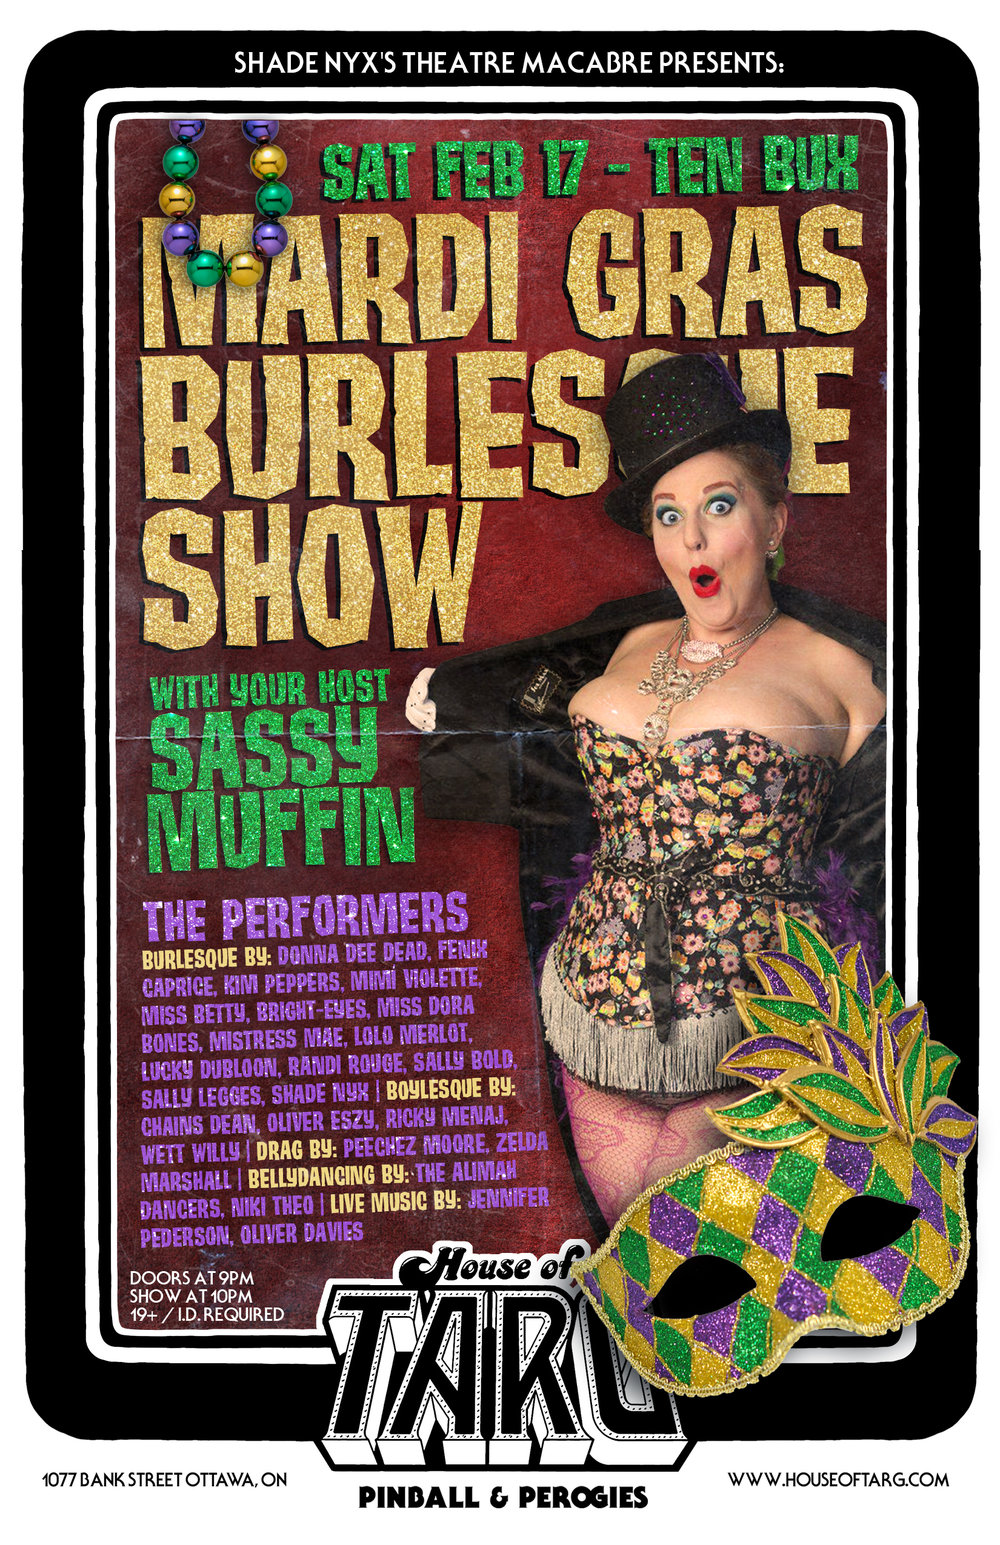 Burlesque feb 2018.jpg